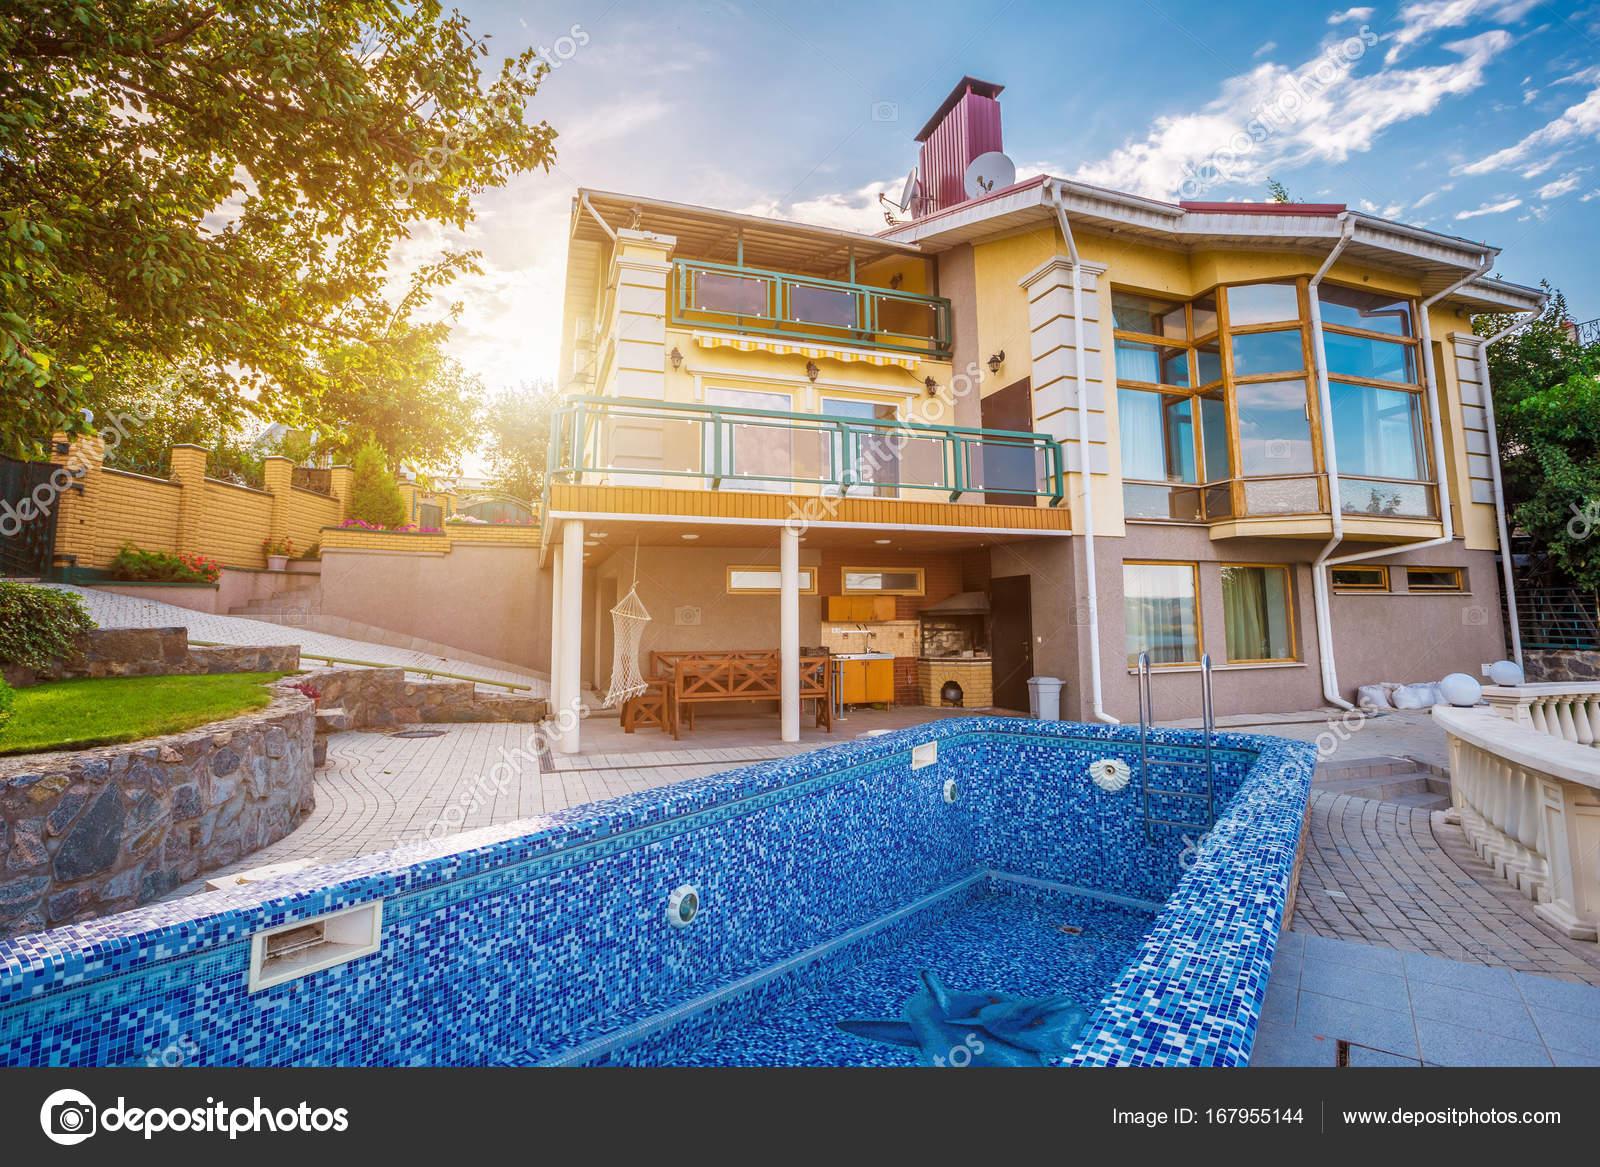 Grande casa di campagna con piscina foto stock 167955144 - Casa con piscina ...